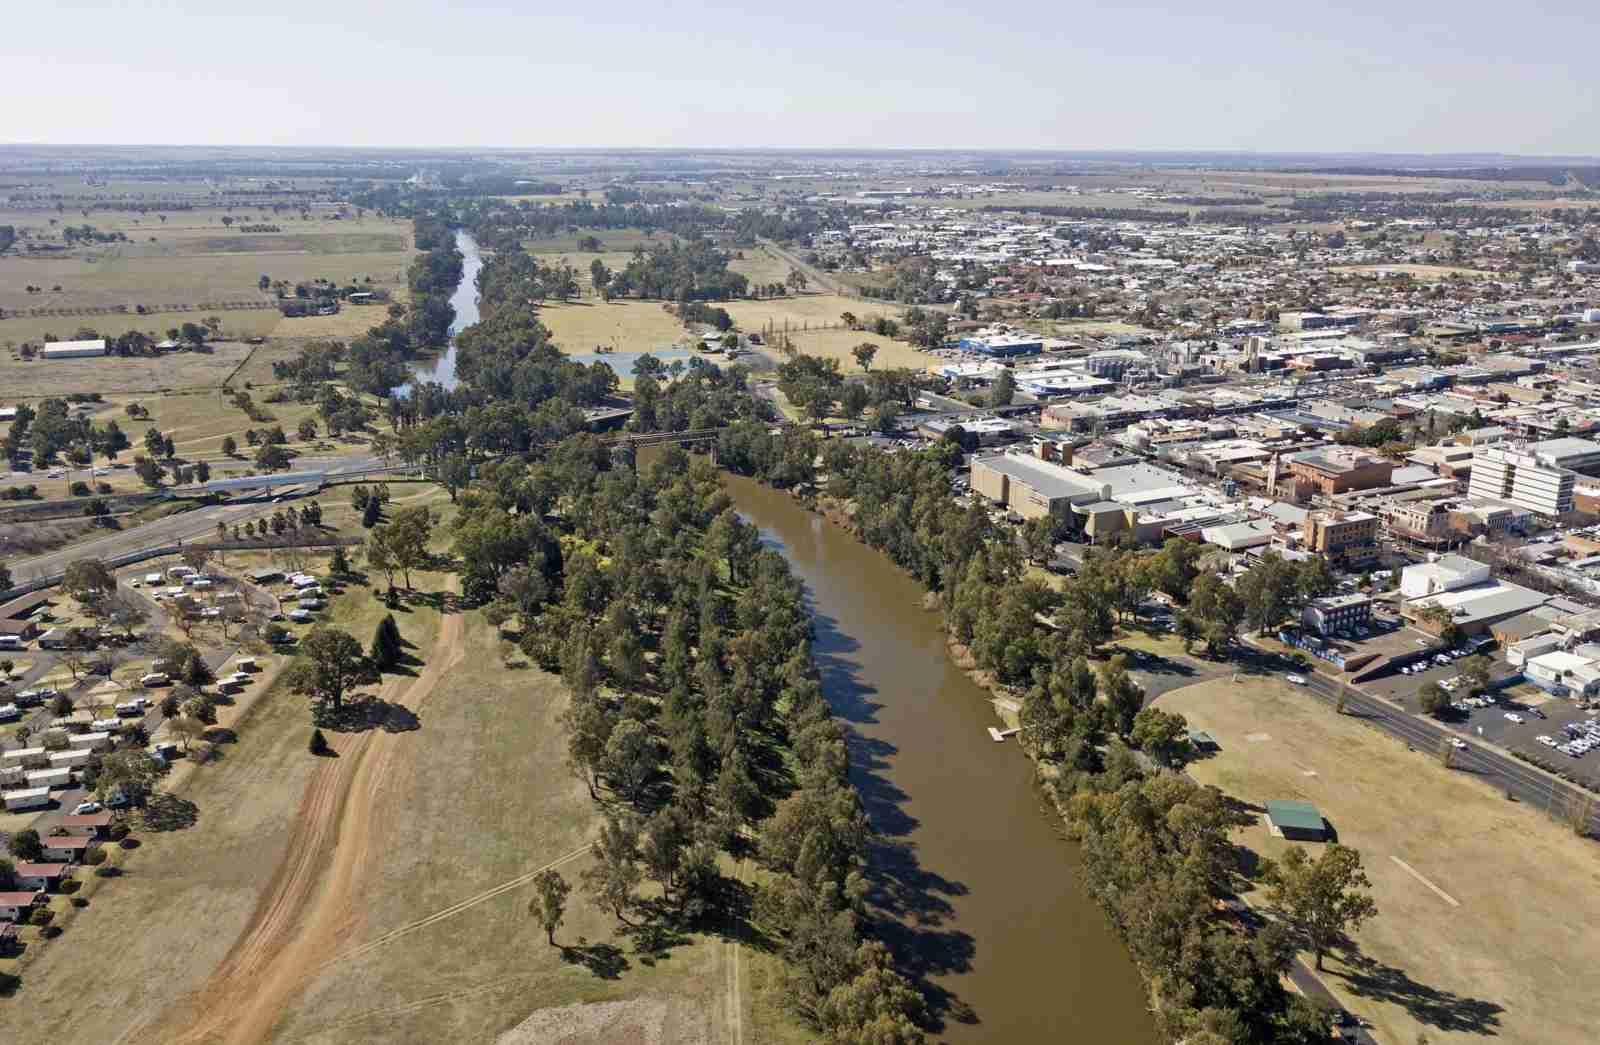 The town of Dubbo, Australia. (Photo by John Carnemolla/Shutterstock)